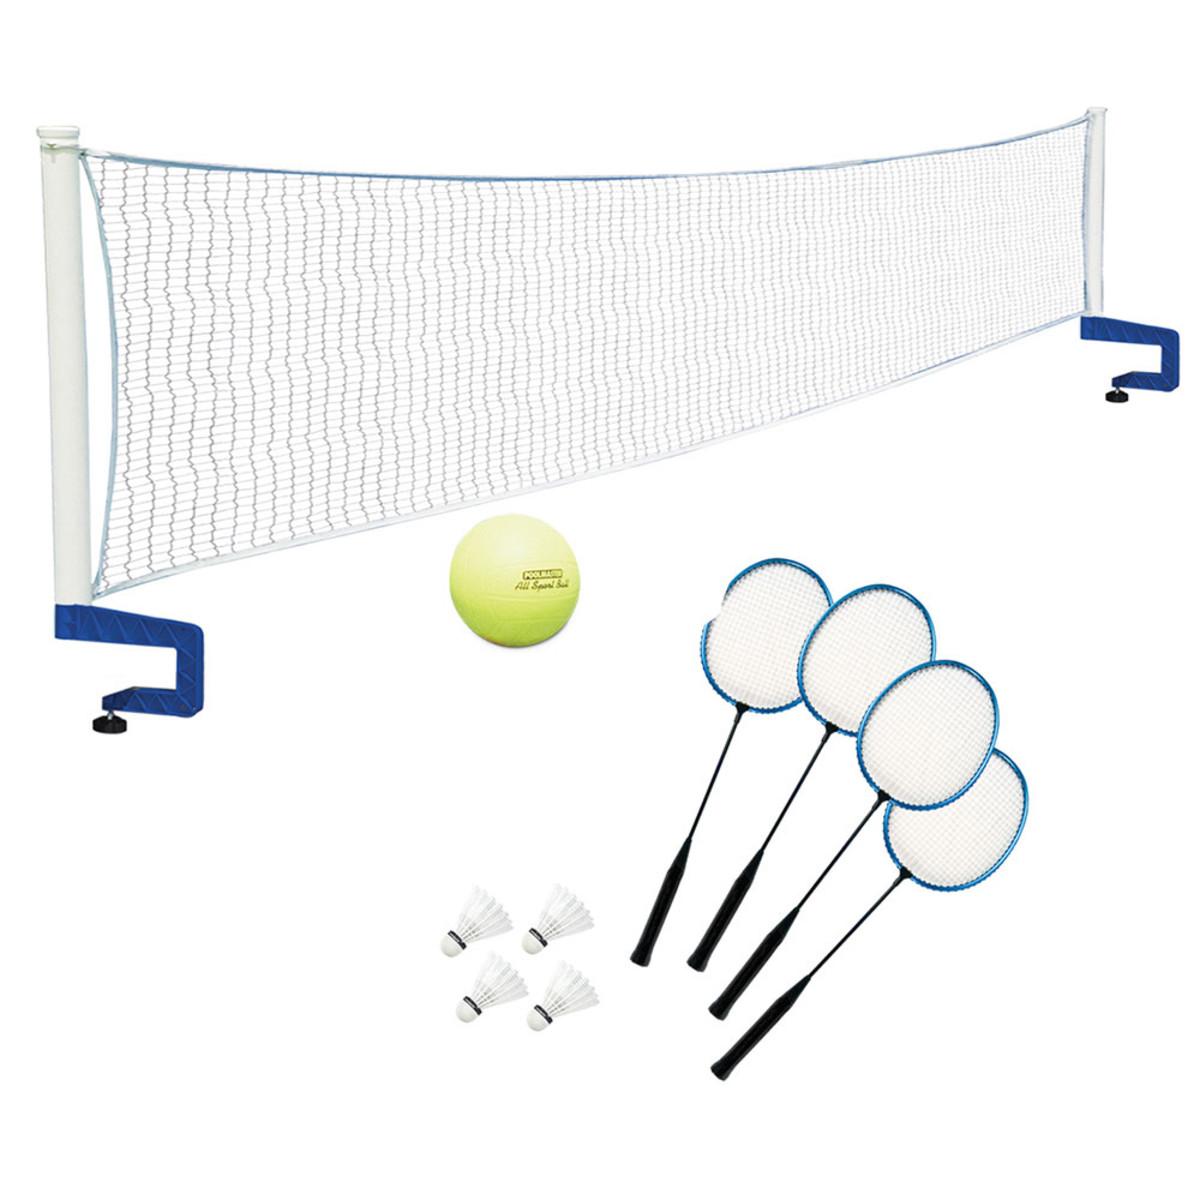 Poolmaster Badminton Amp Volleyball Game Combo Splash